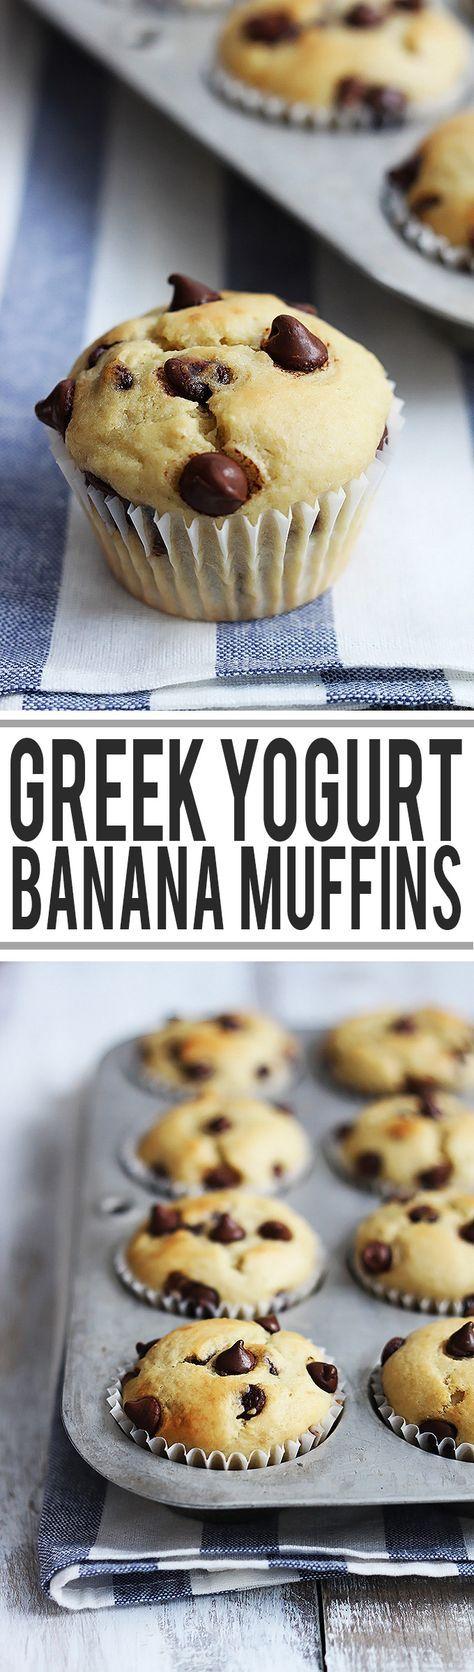 Easy and fluffy, super-moist banana greek yogurt muffins with a boost of breakfast-worthy protein! | Creme de la Crumb